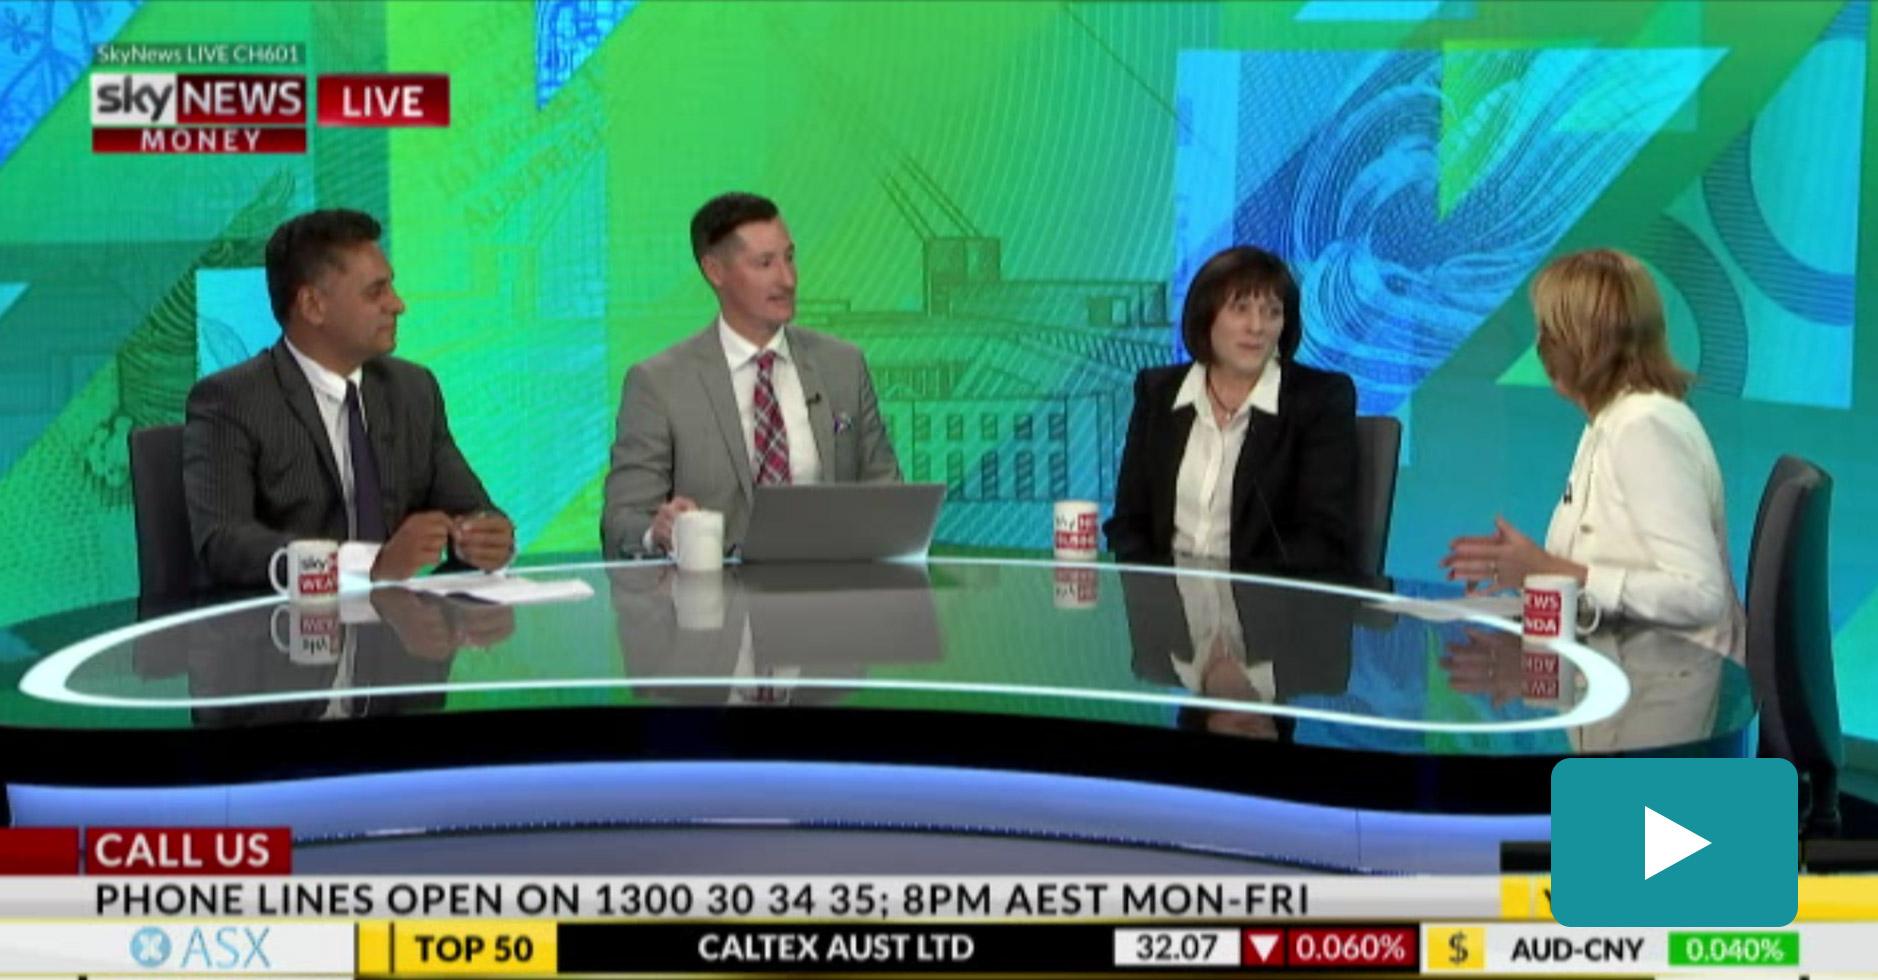 SkyNews YMYC PLAY Insurance Explained